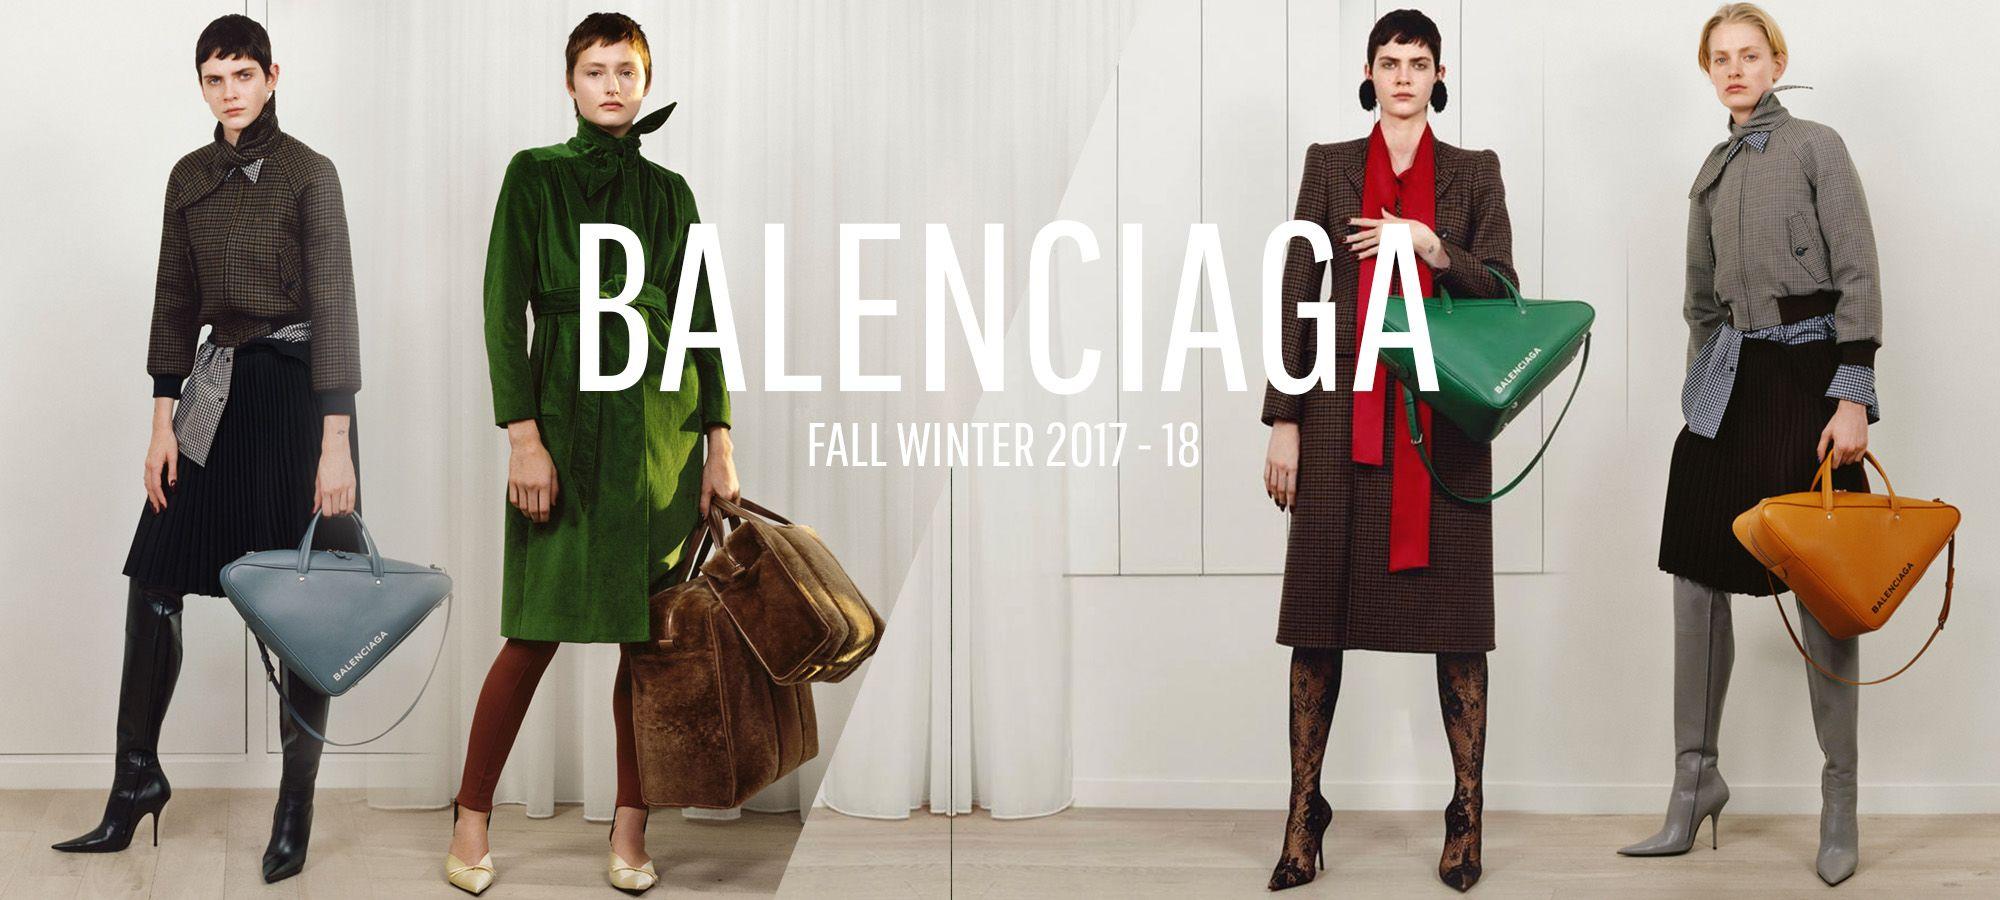 Women - Fall Winter 2017